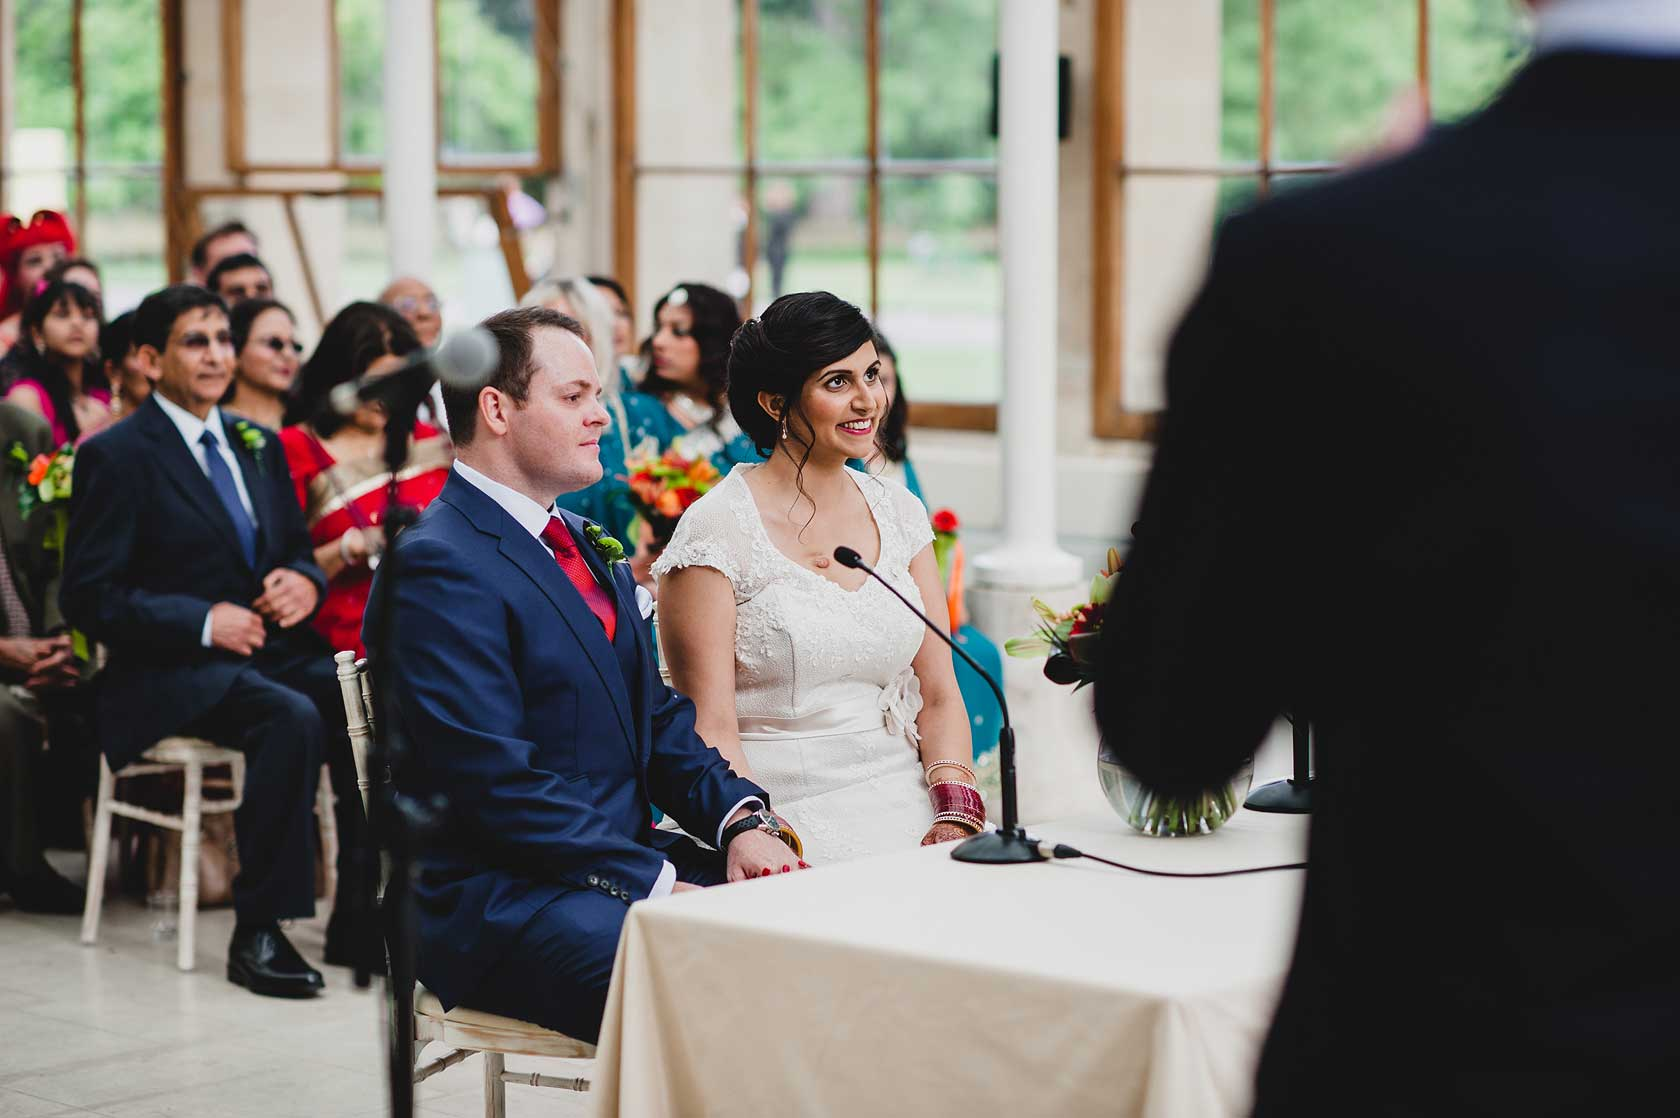 Wedding Photographer at Kew Gardens